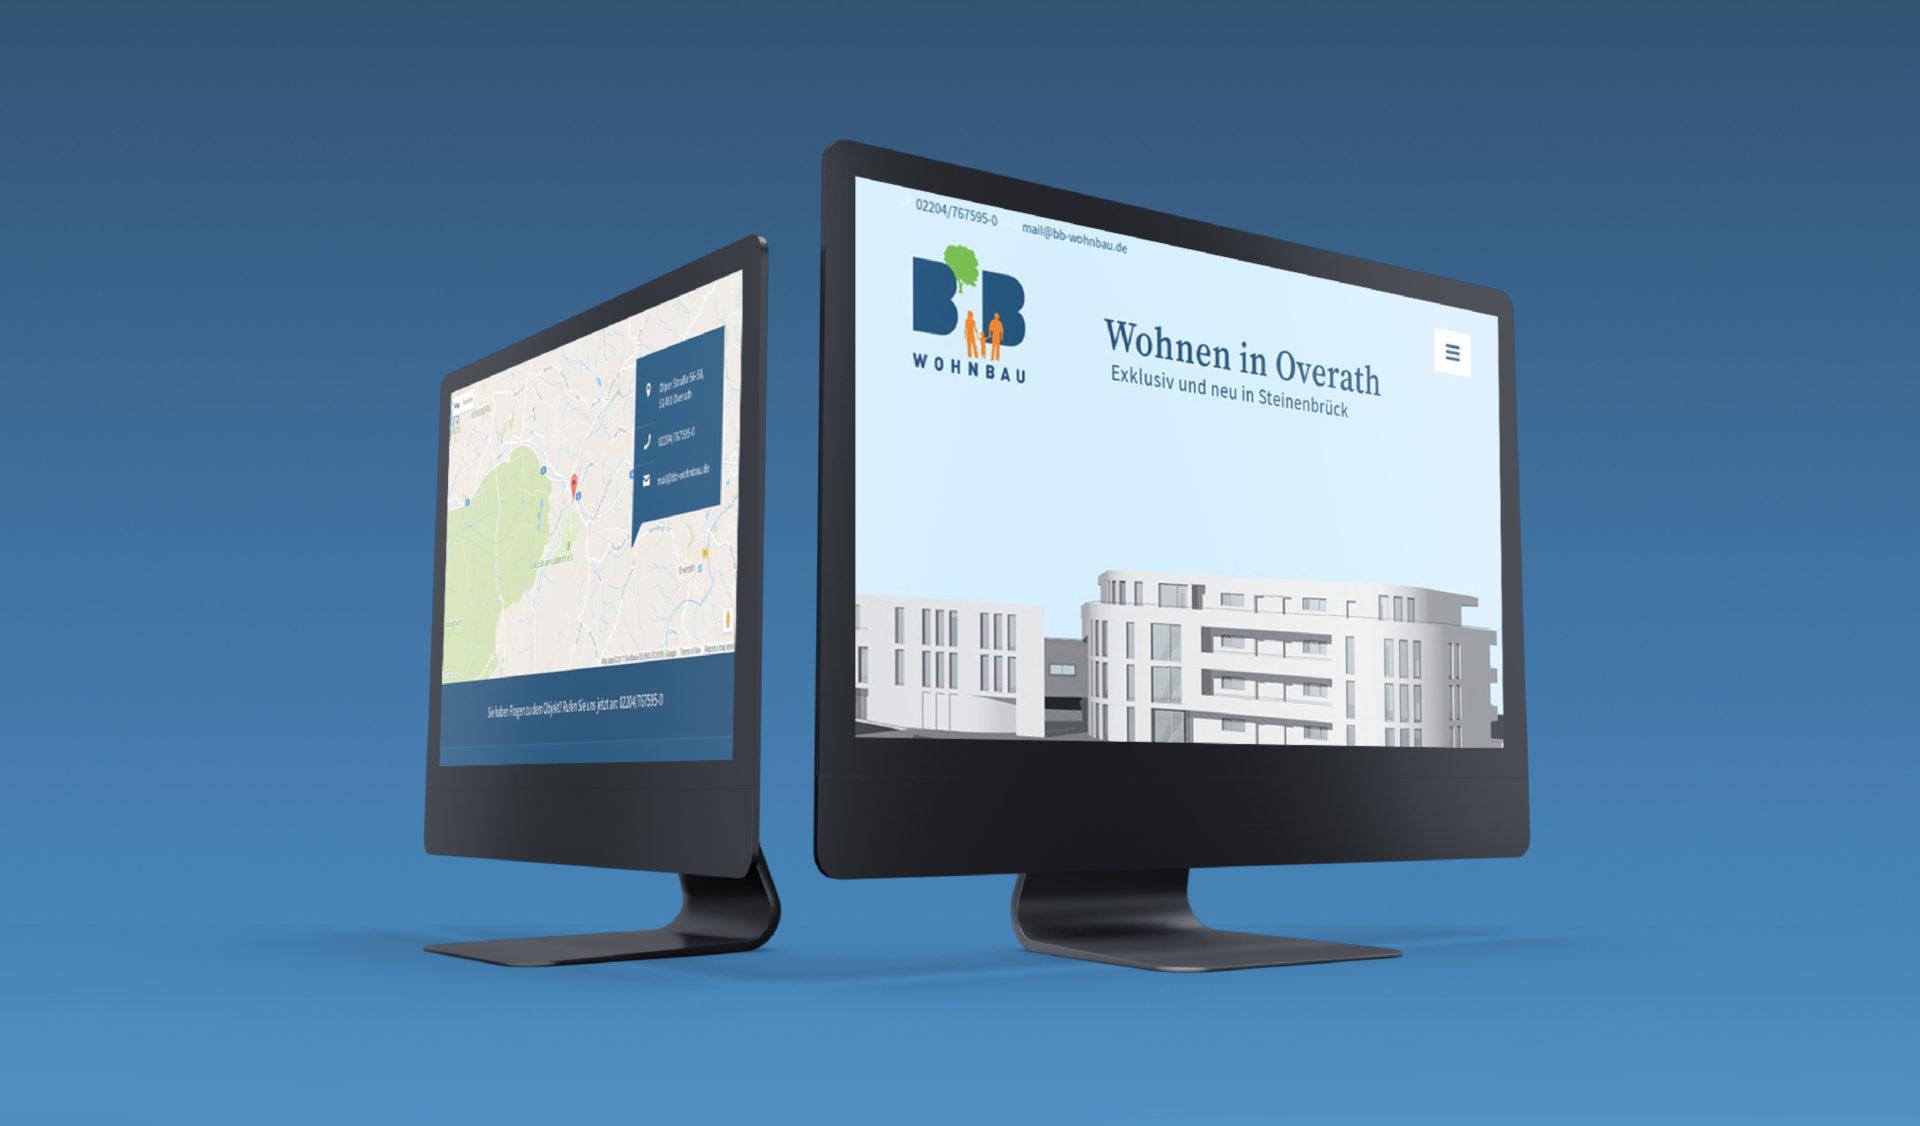 Bb Wohnbau Referenz 1 Webdesign